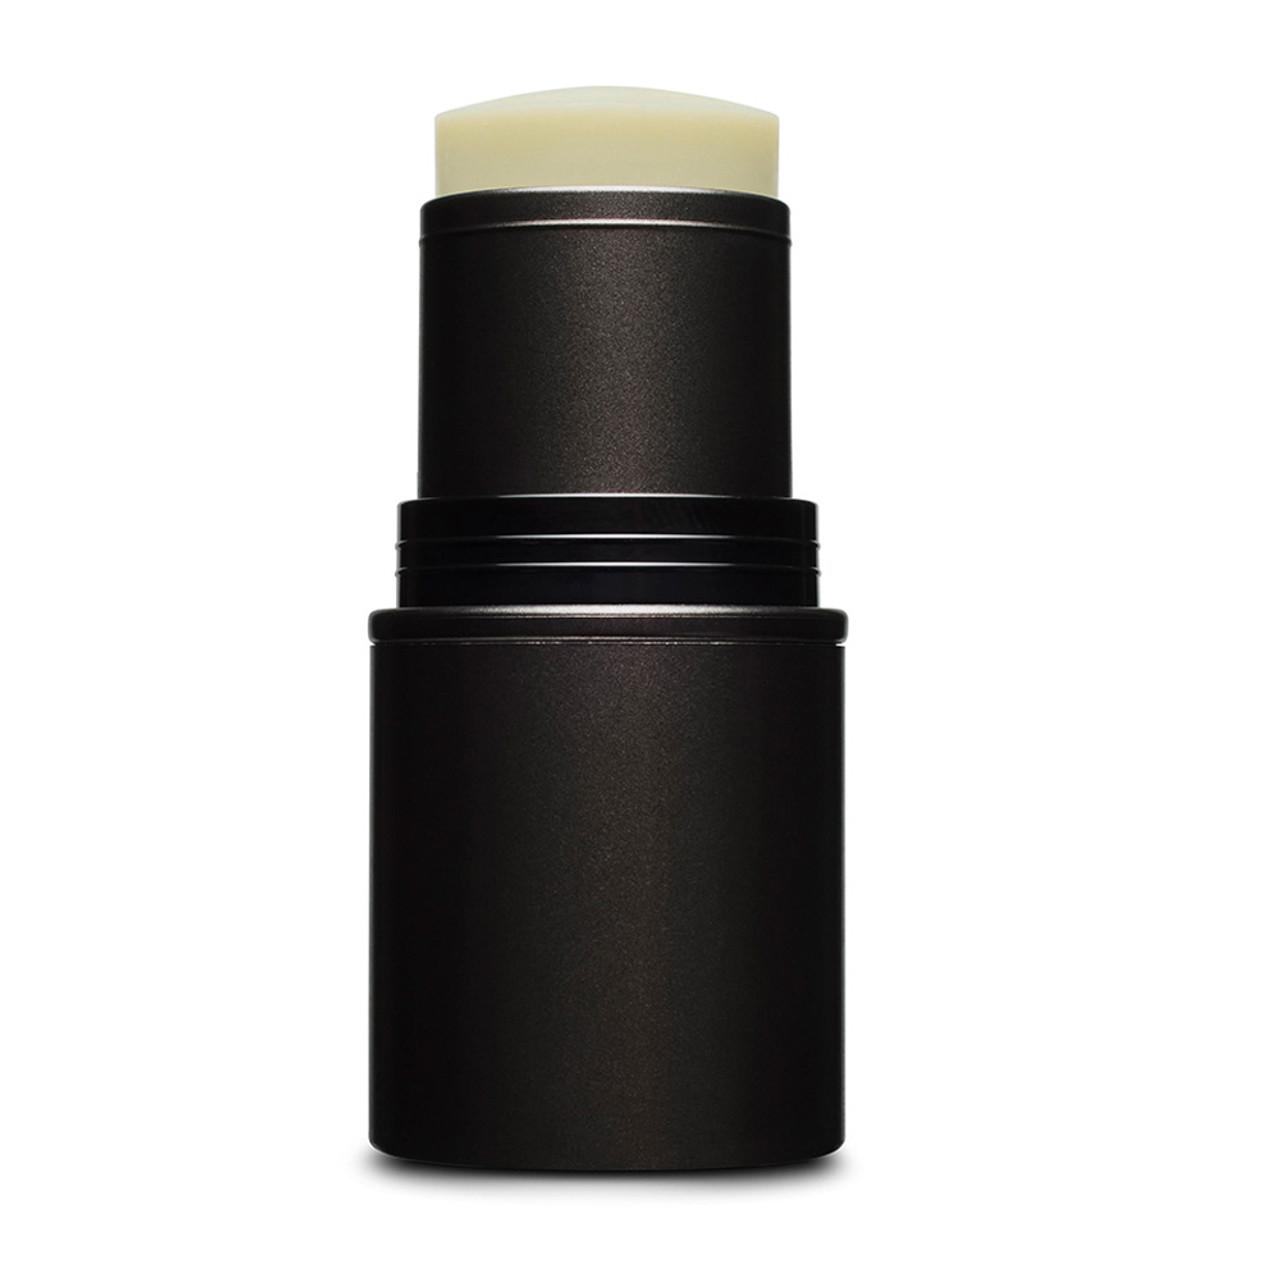 Eminence Rosehip & Lemongrass Lip Balm SPF 15